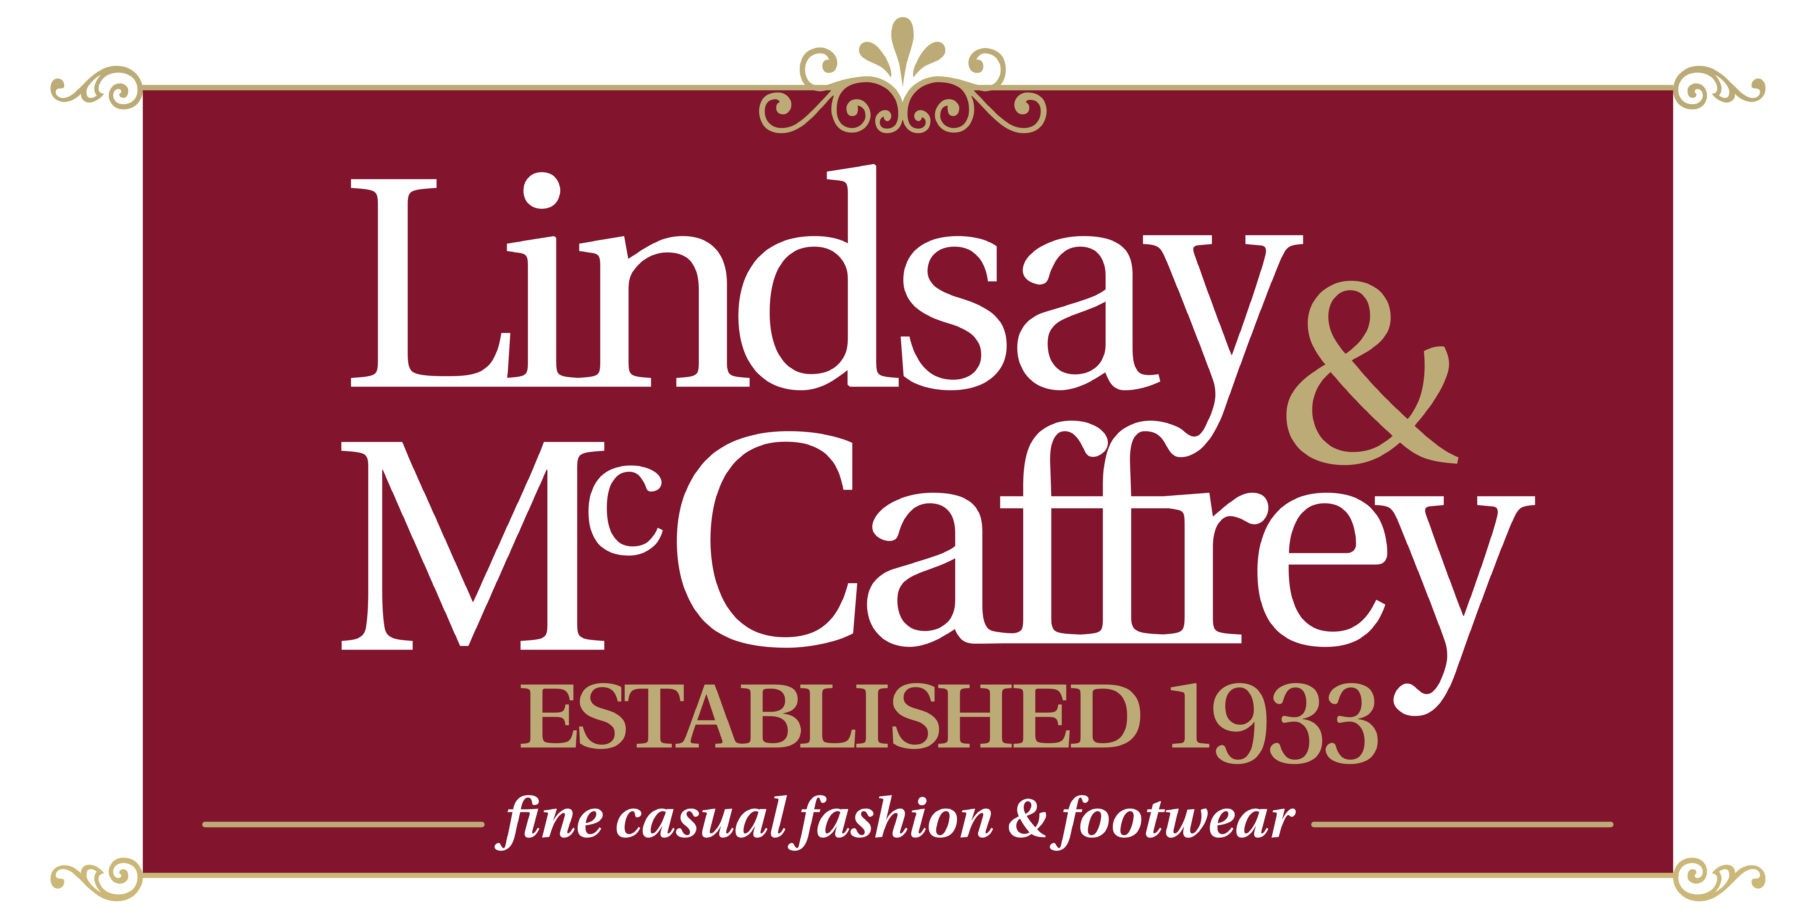 Lindsay & McCaffrey logo